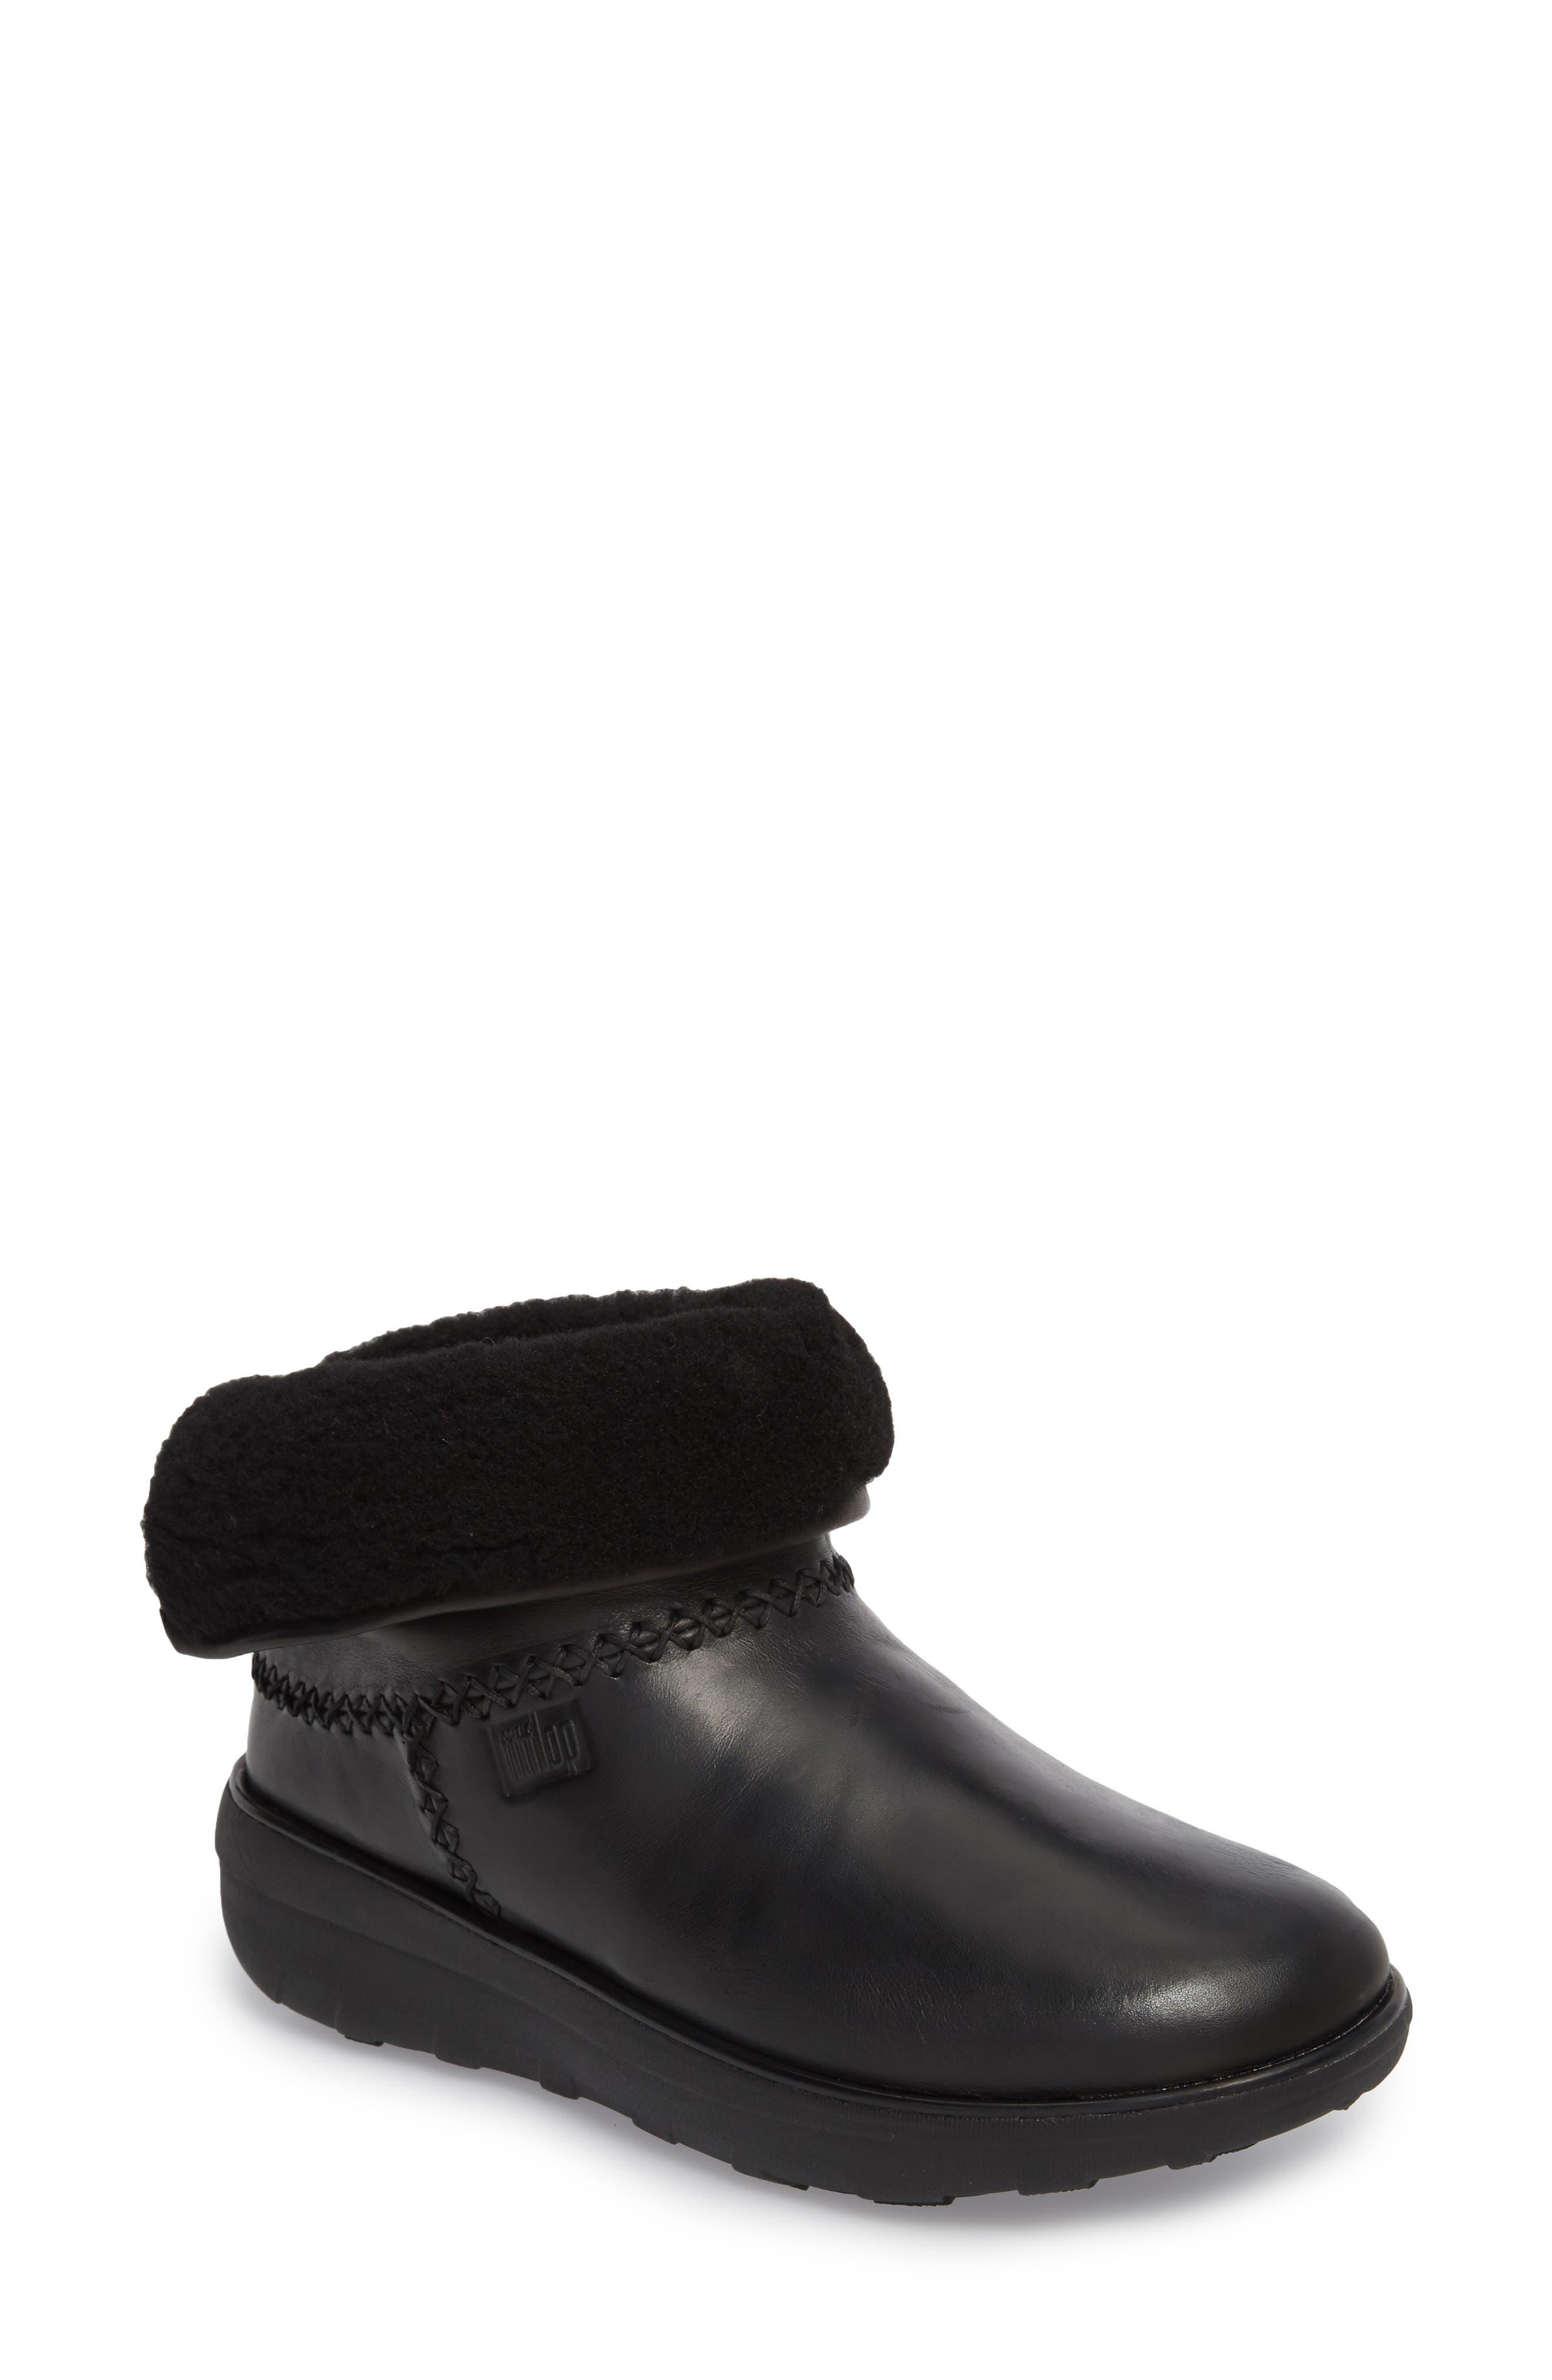 Mukluk Shorty II Boot,                             Main thumbnail 1, color,                             Black Leather